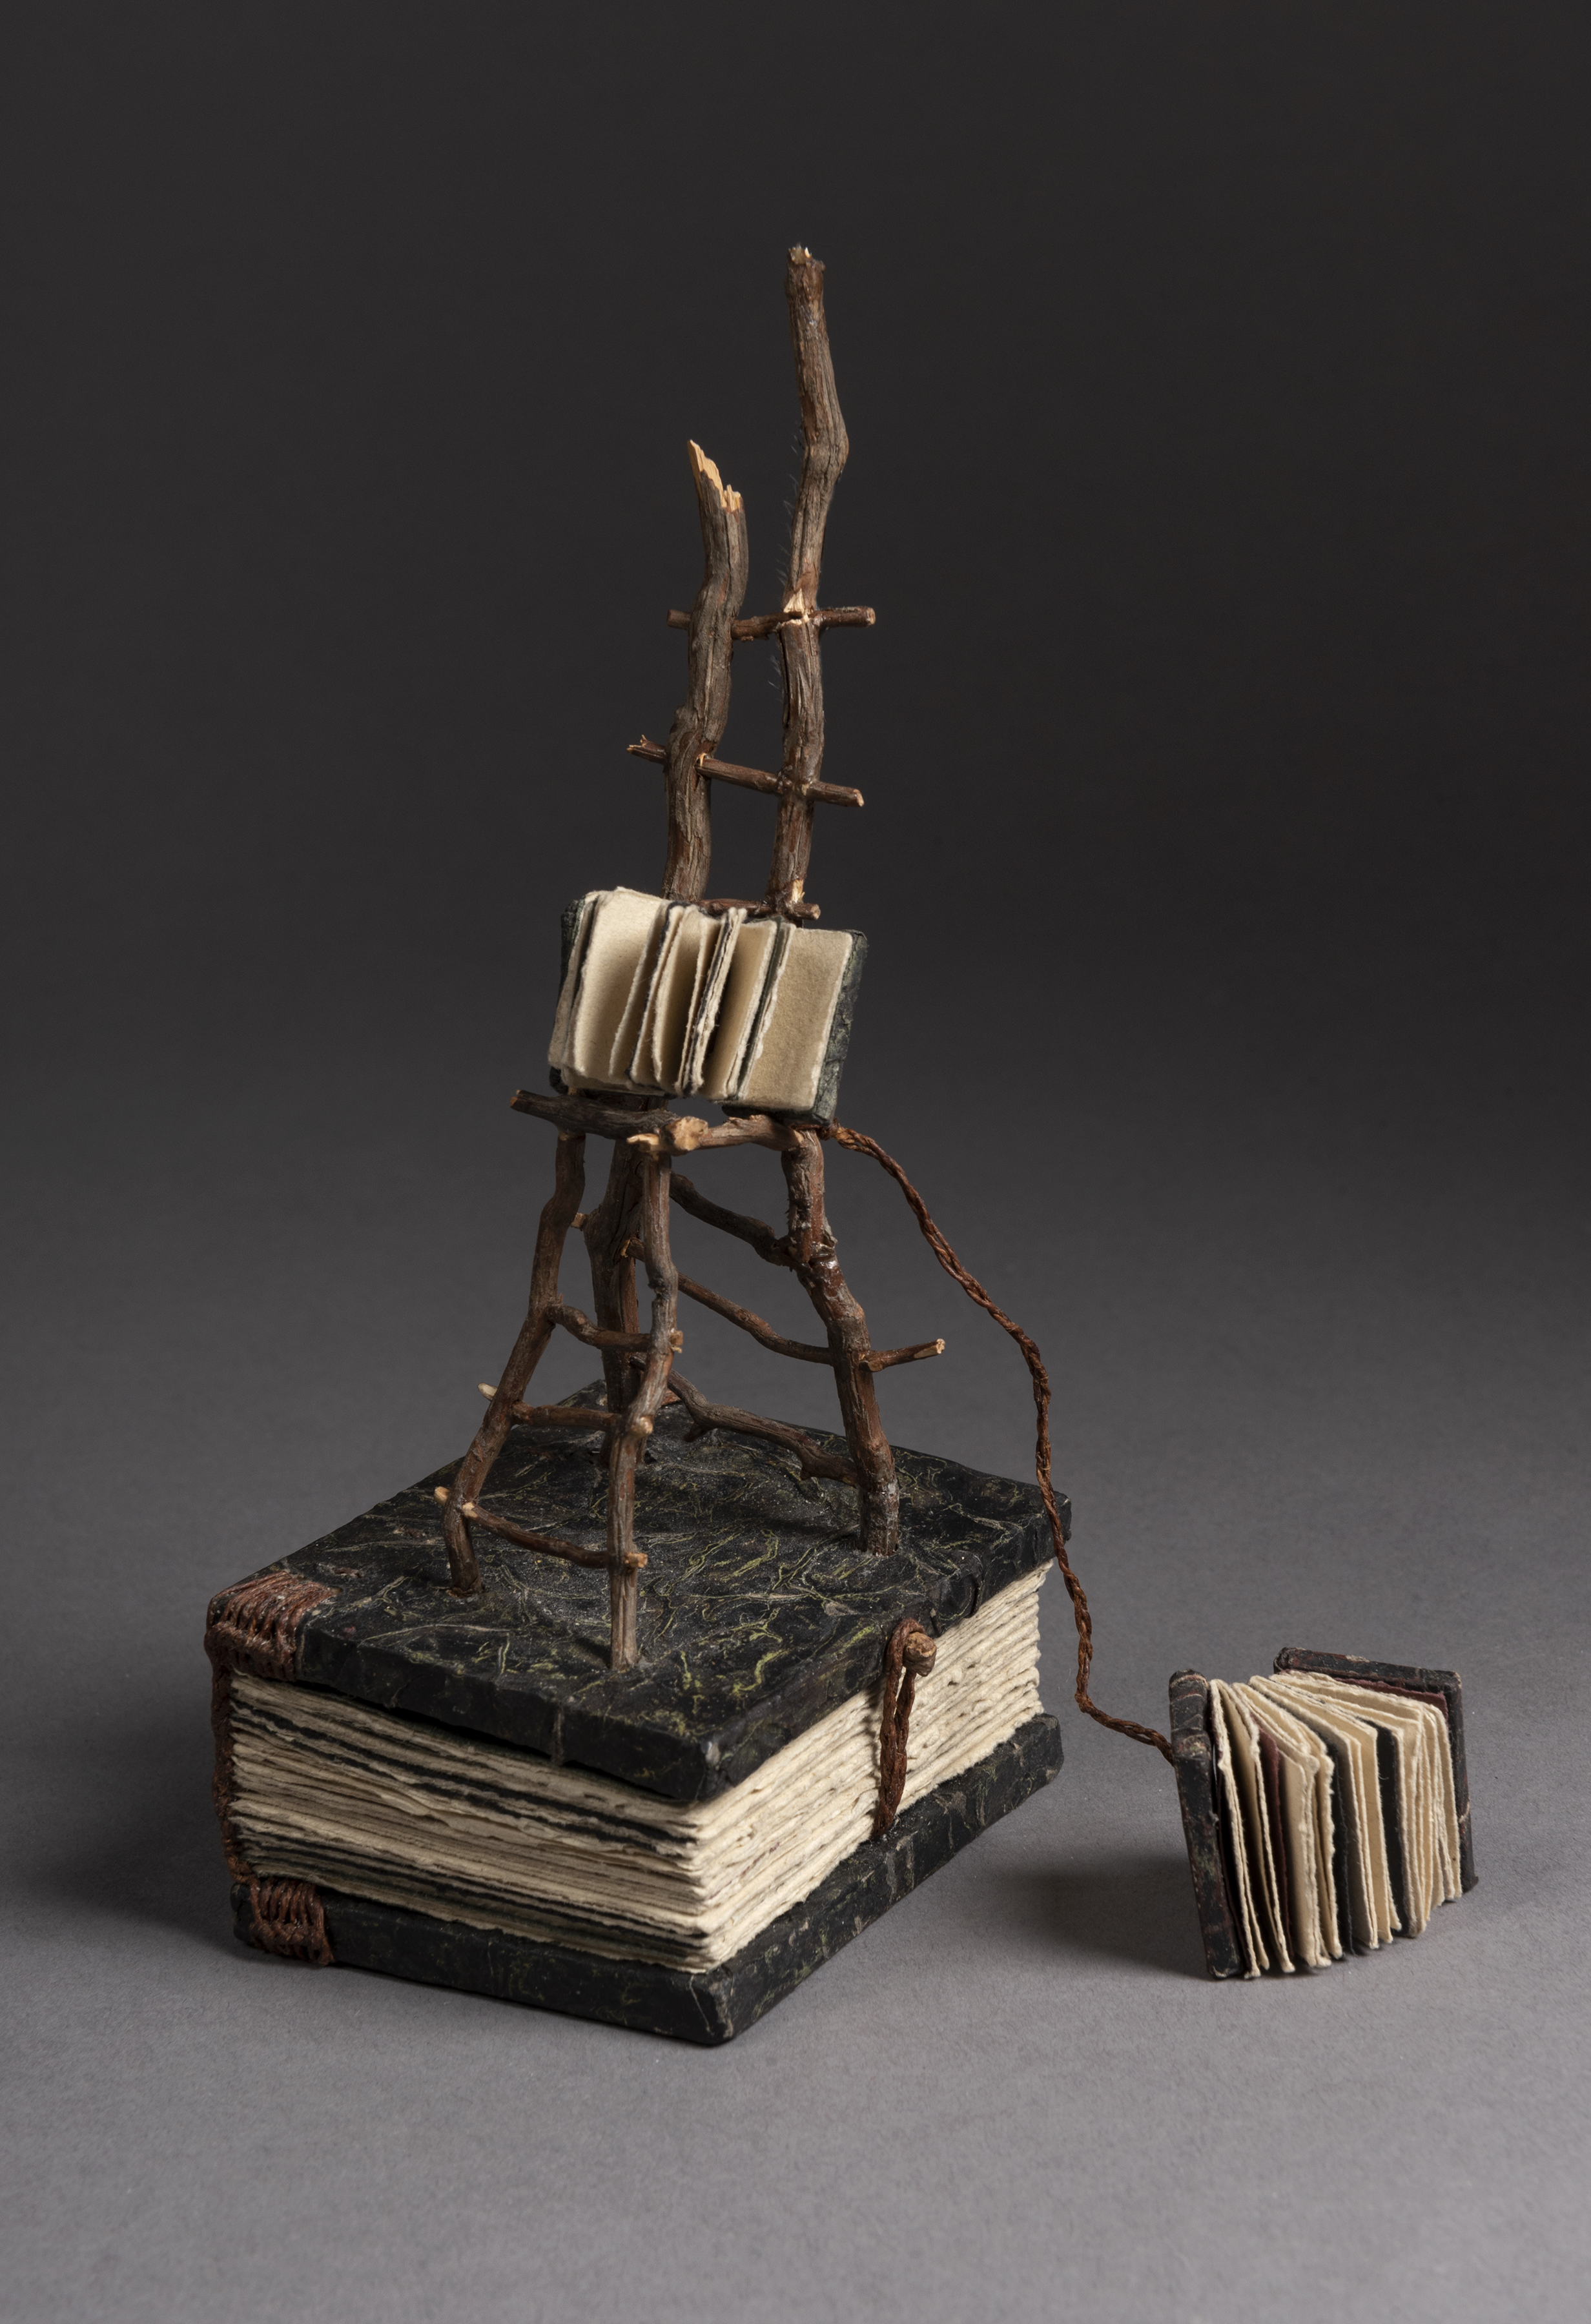 ladderbookchair.jpg